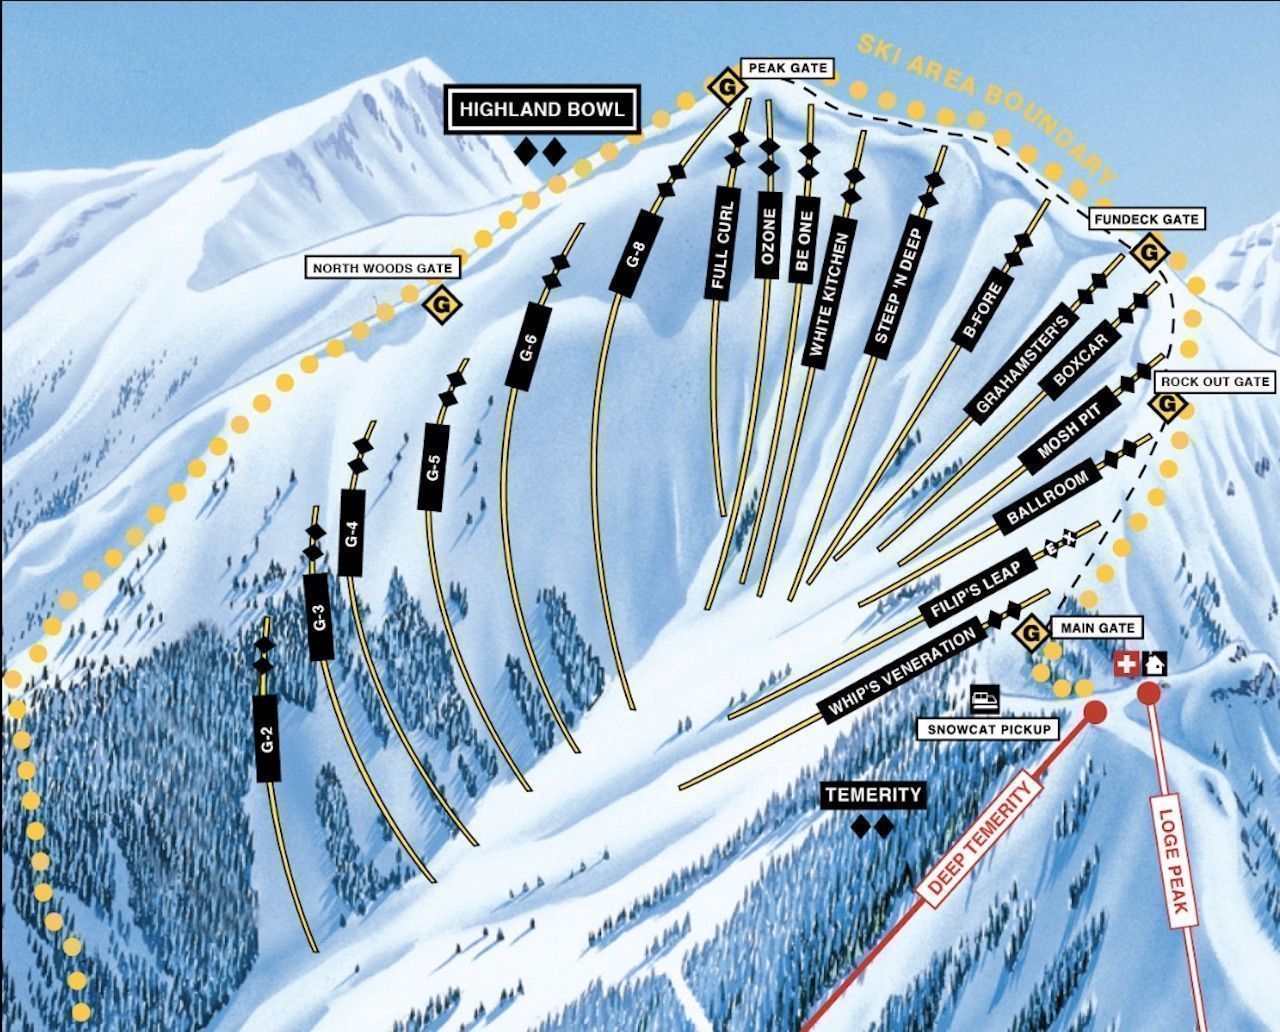 Aspen highland bowl ski run map